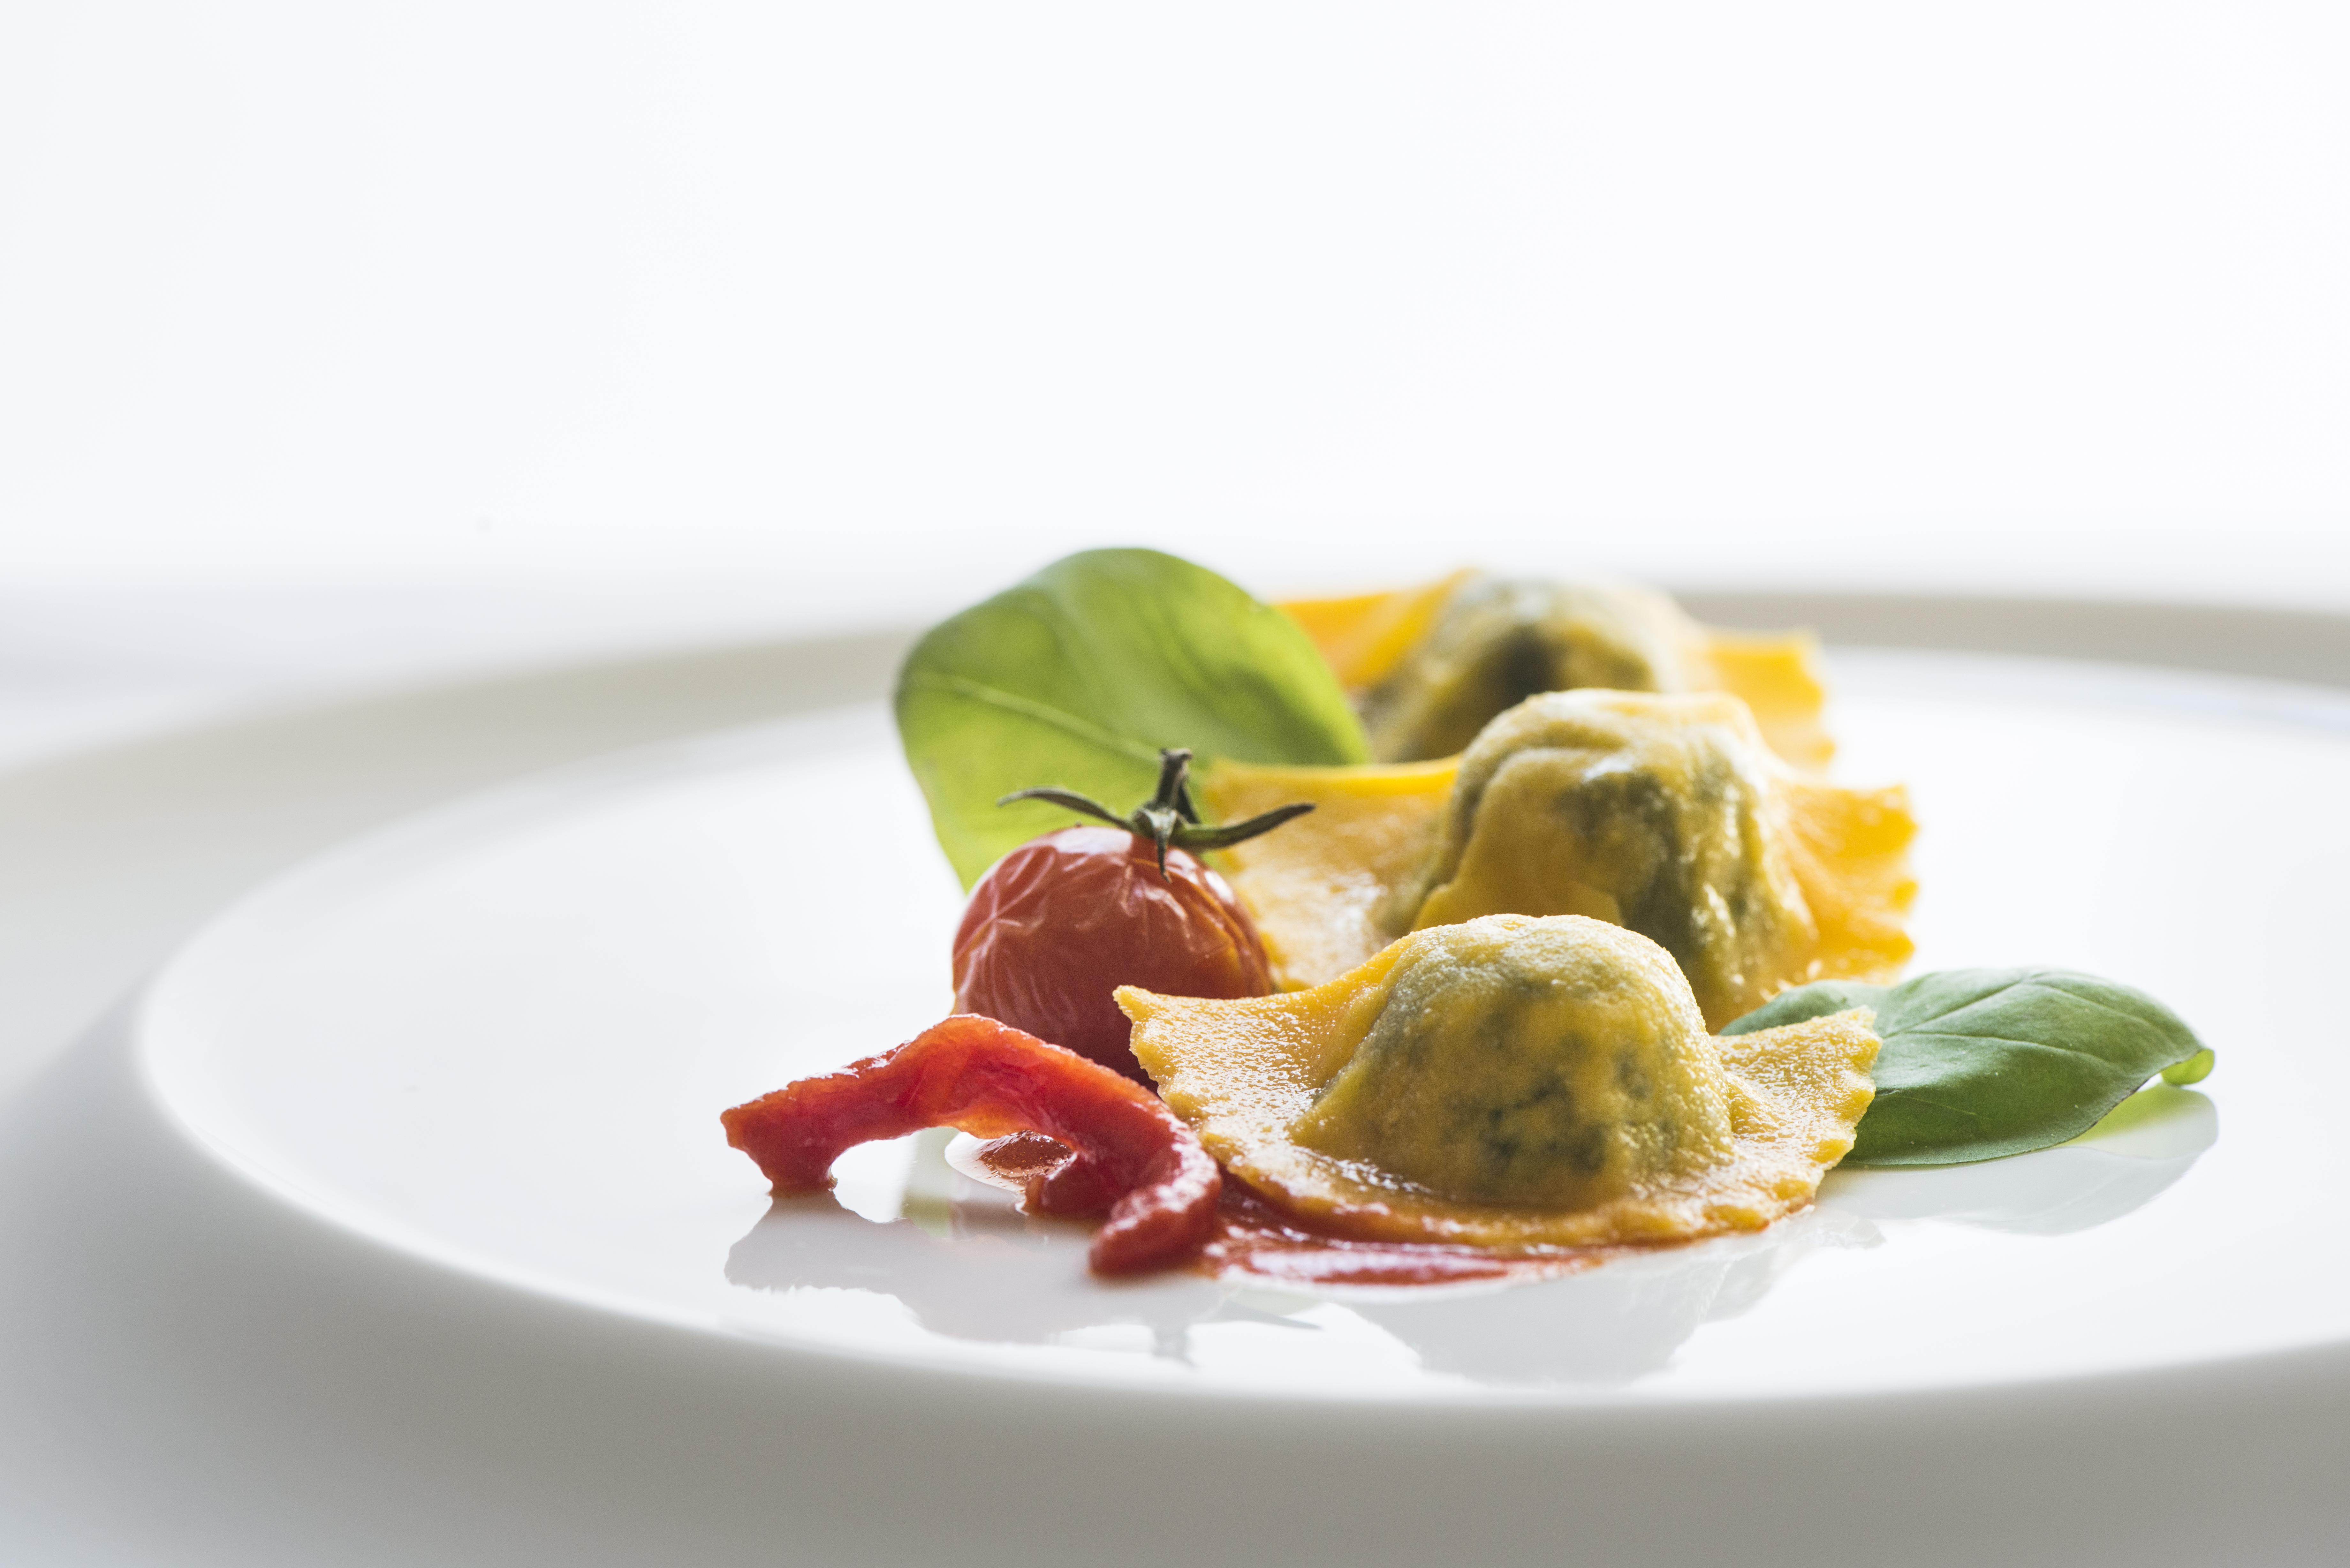 Italian Ravioli Recipes - Great Italian Chefs